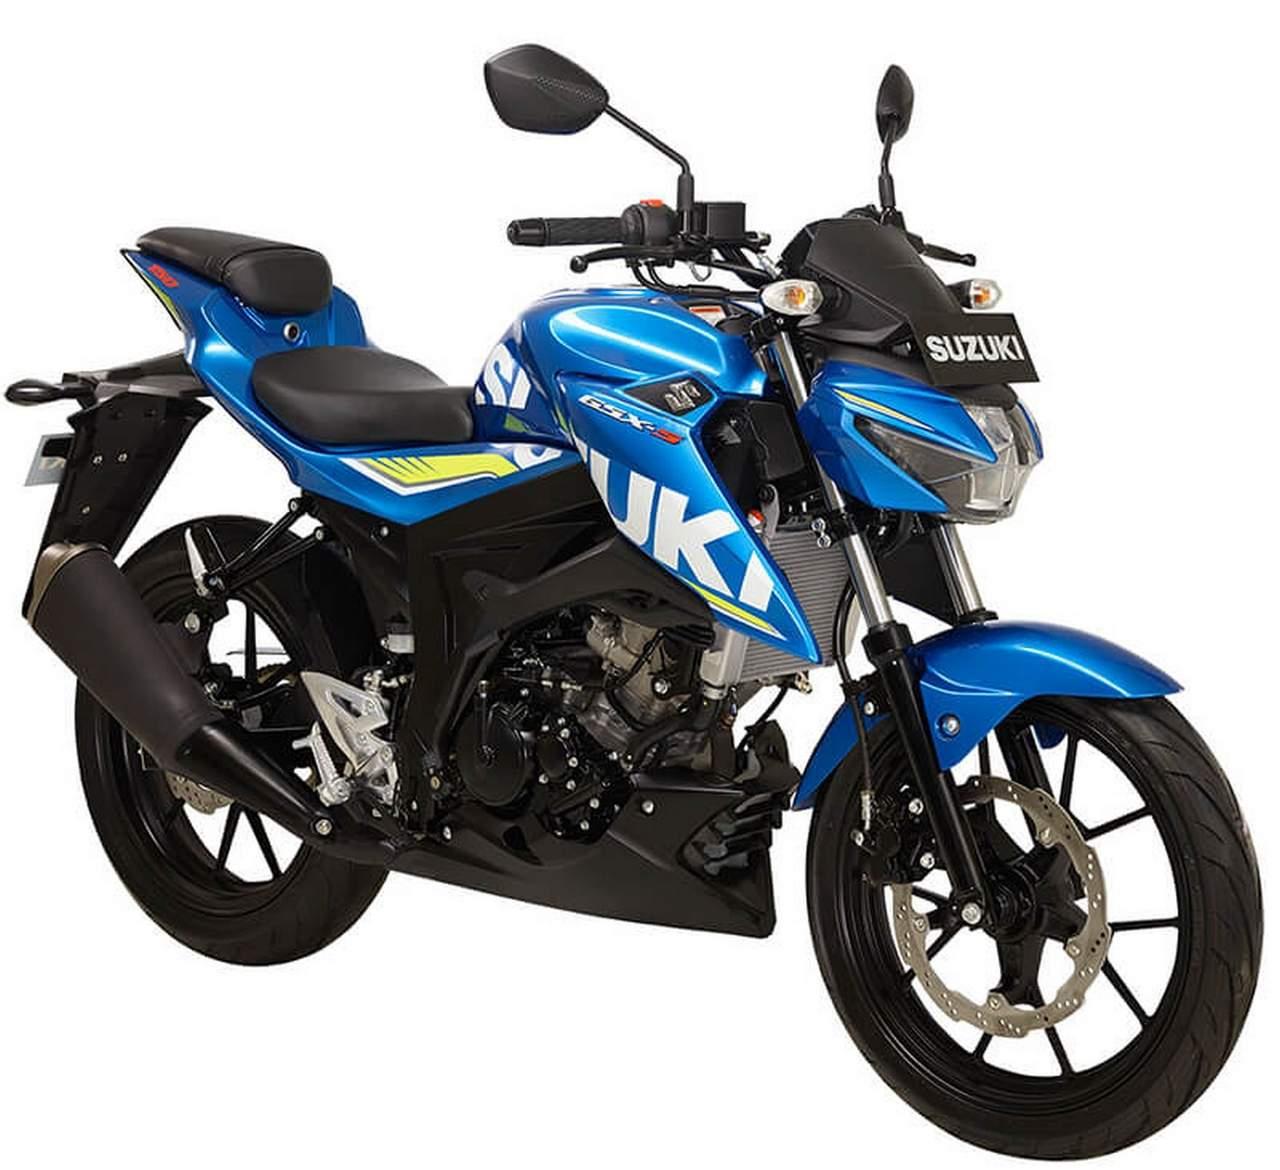 Suzuki Gixxer  Launch Date In India